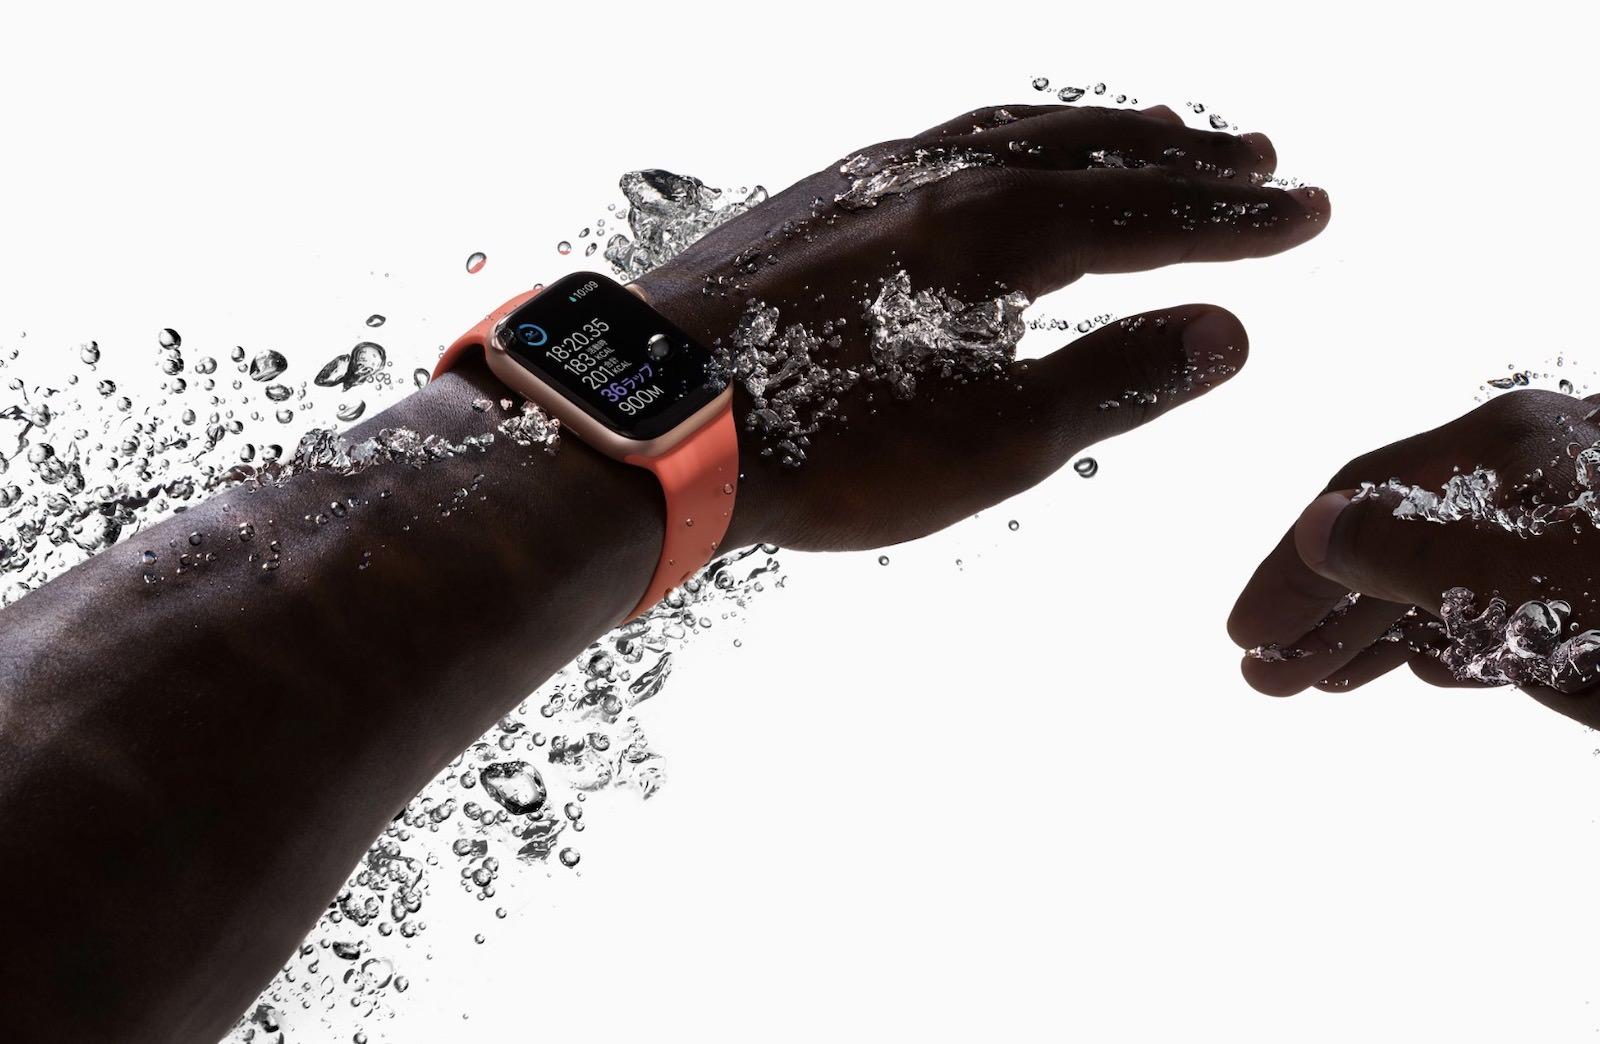 Apple-Watch-Using-underwater.jpg